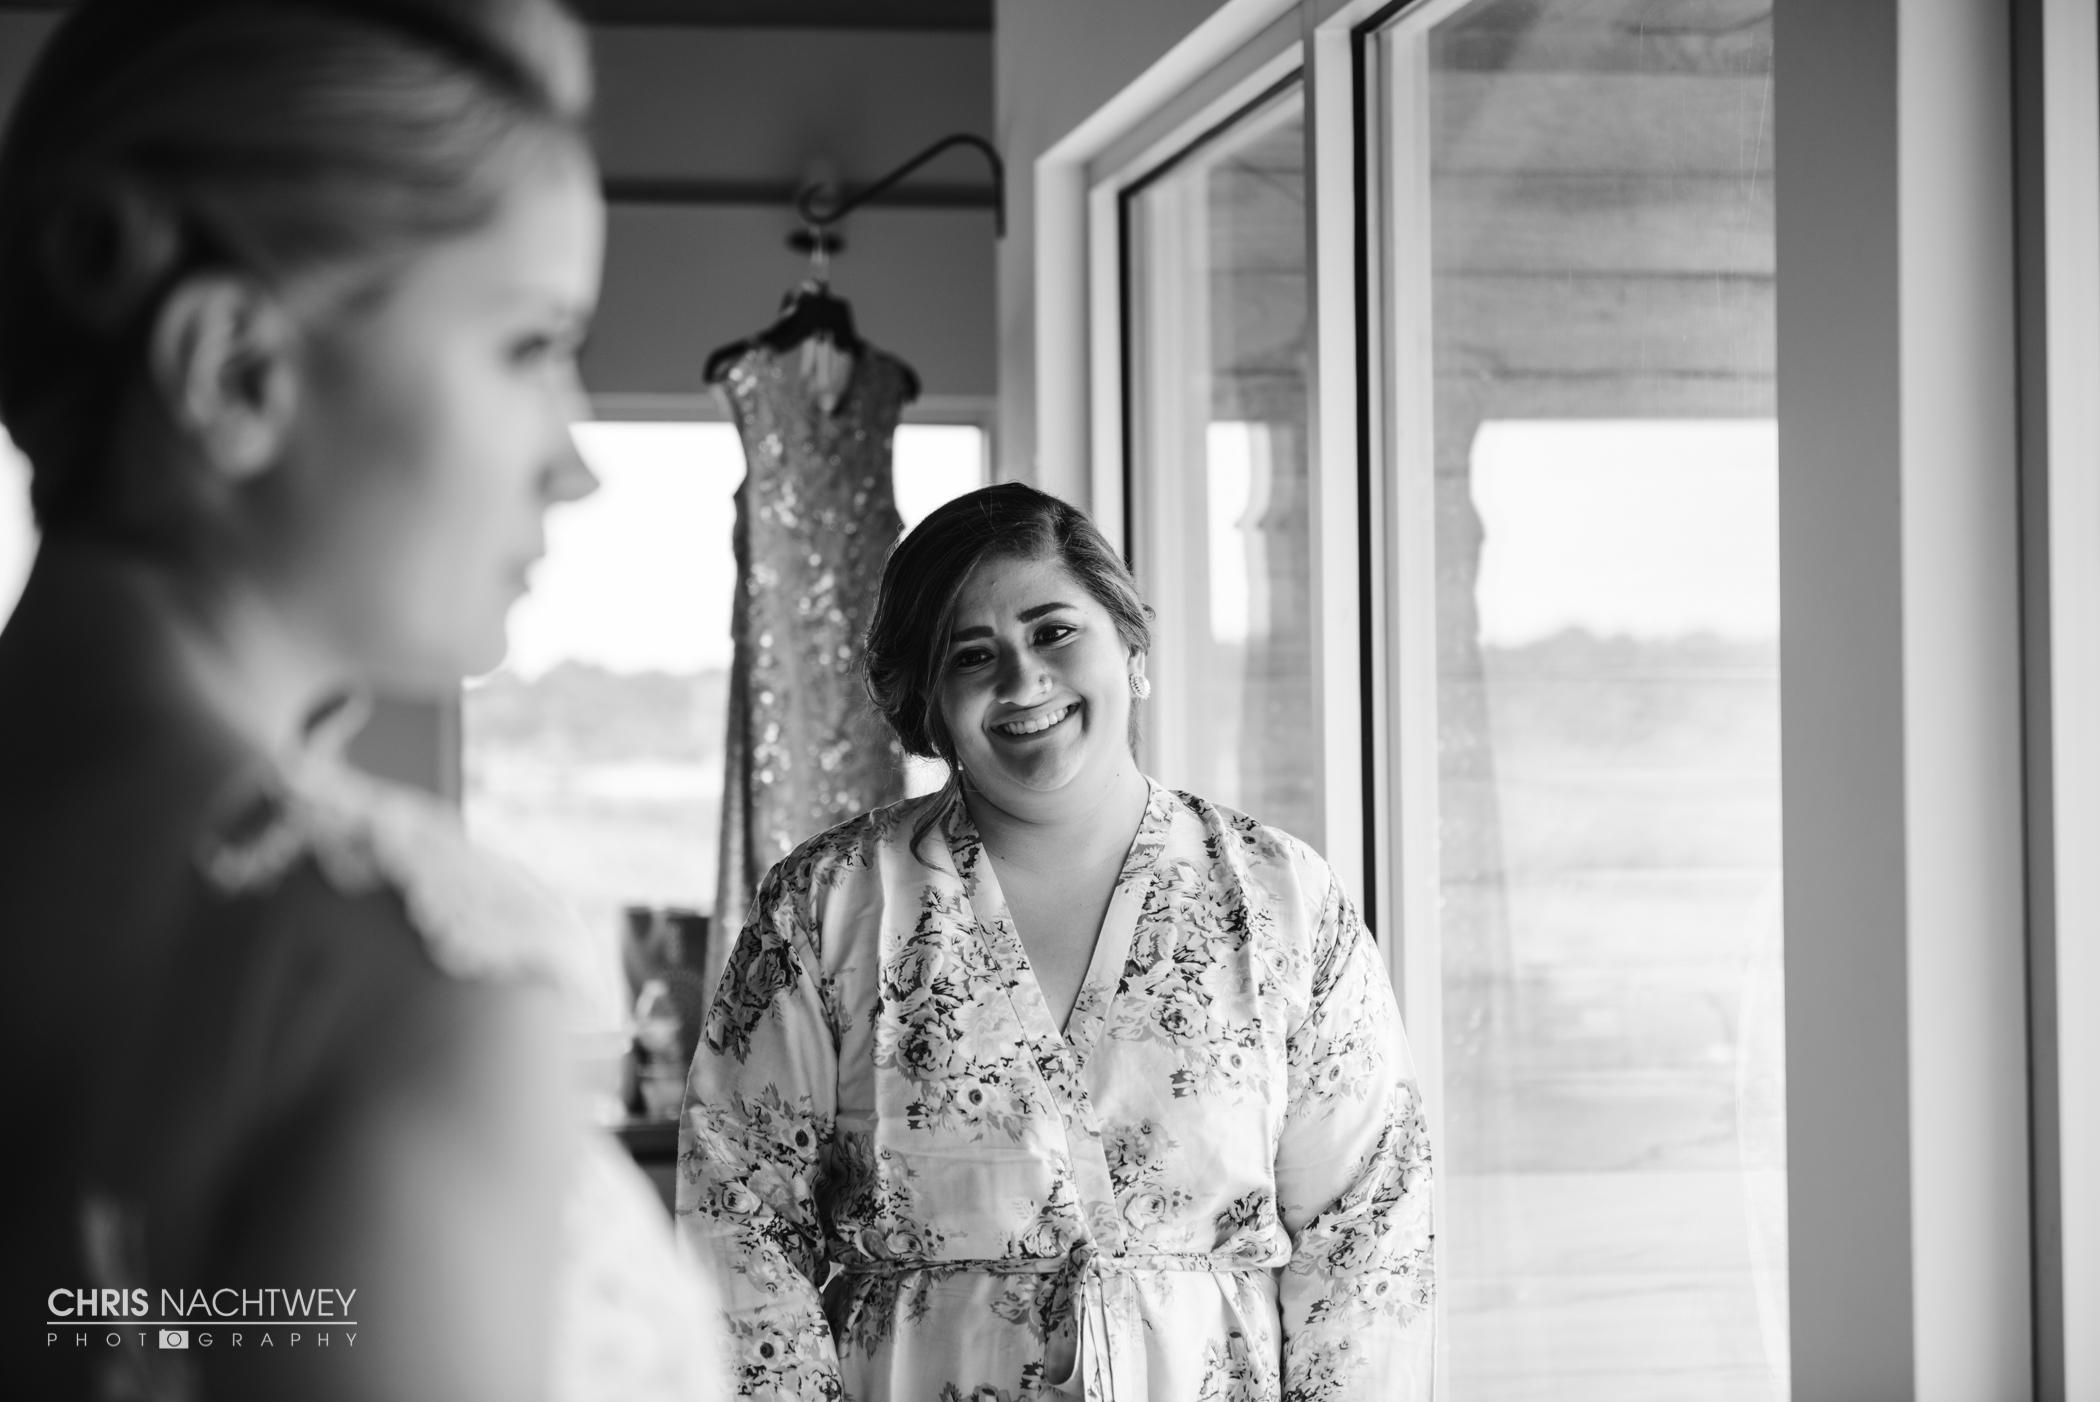 wedding-saltwater-farm-vineyard-photos-stonington-ct-chris-nachtwey-photography-2016-ana-austin-8.jpg